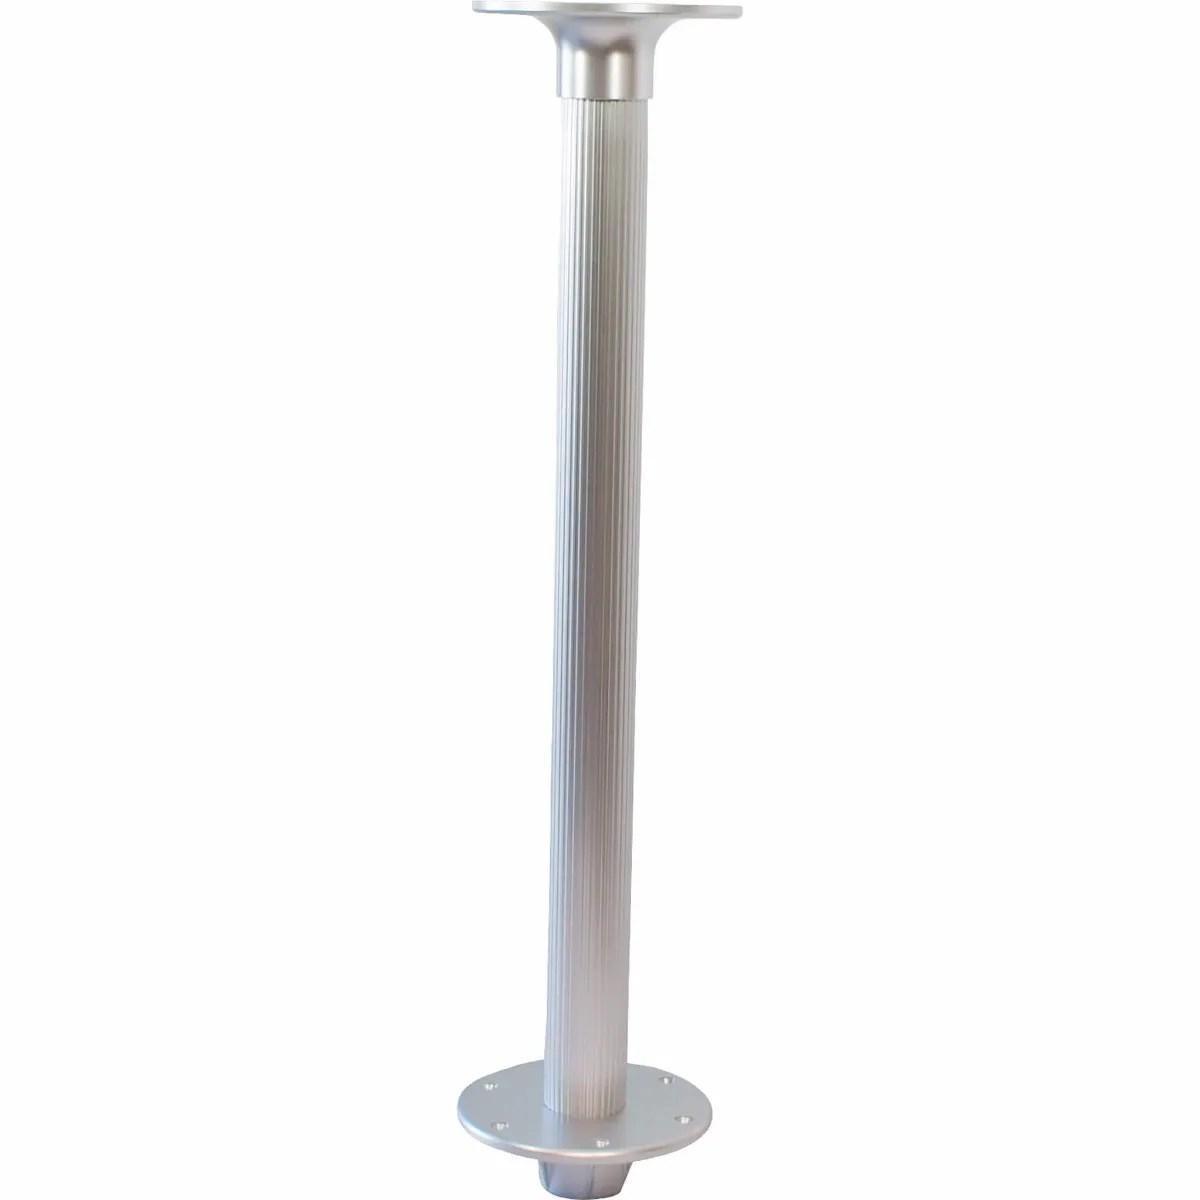 Marine Table Pedestals Post Brass Table Legs By Balasagun